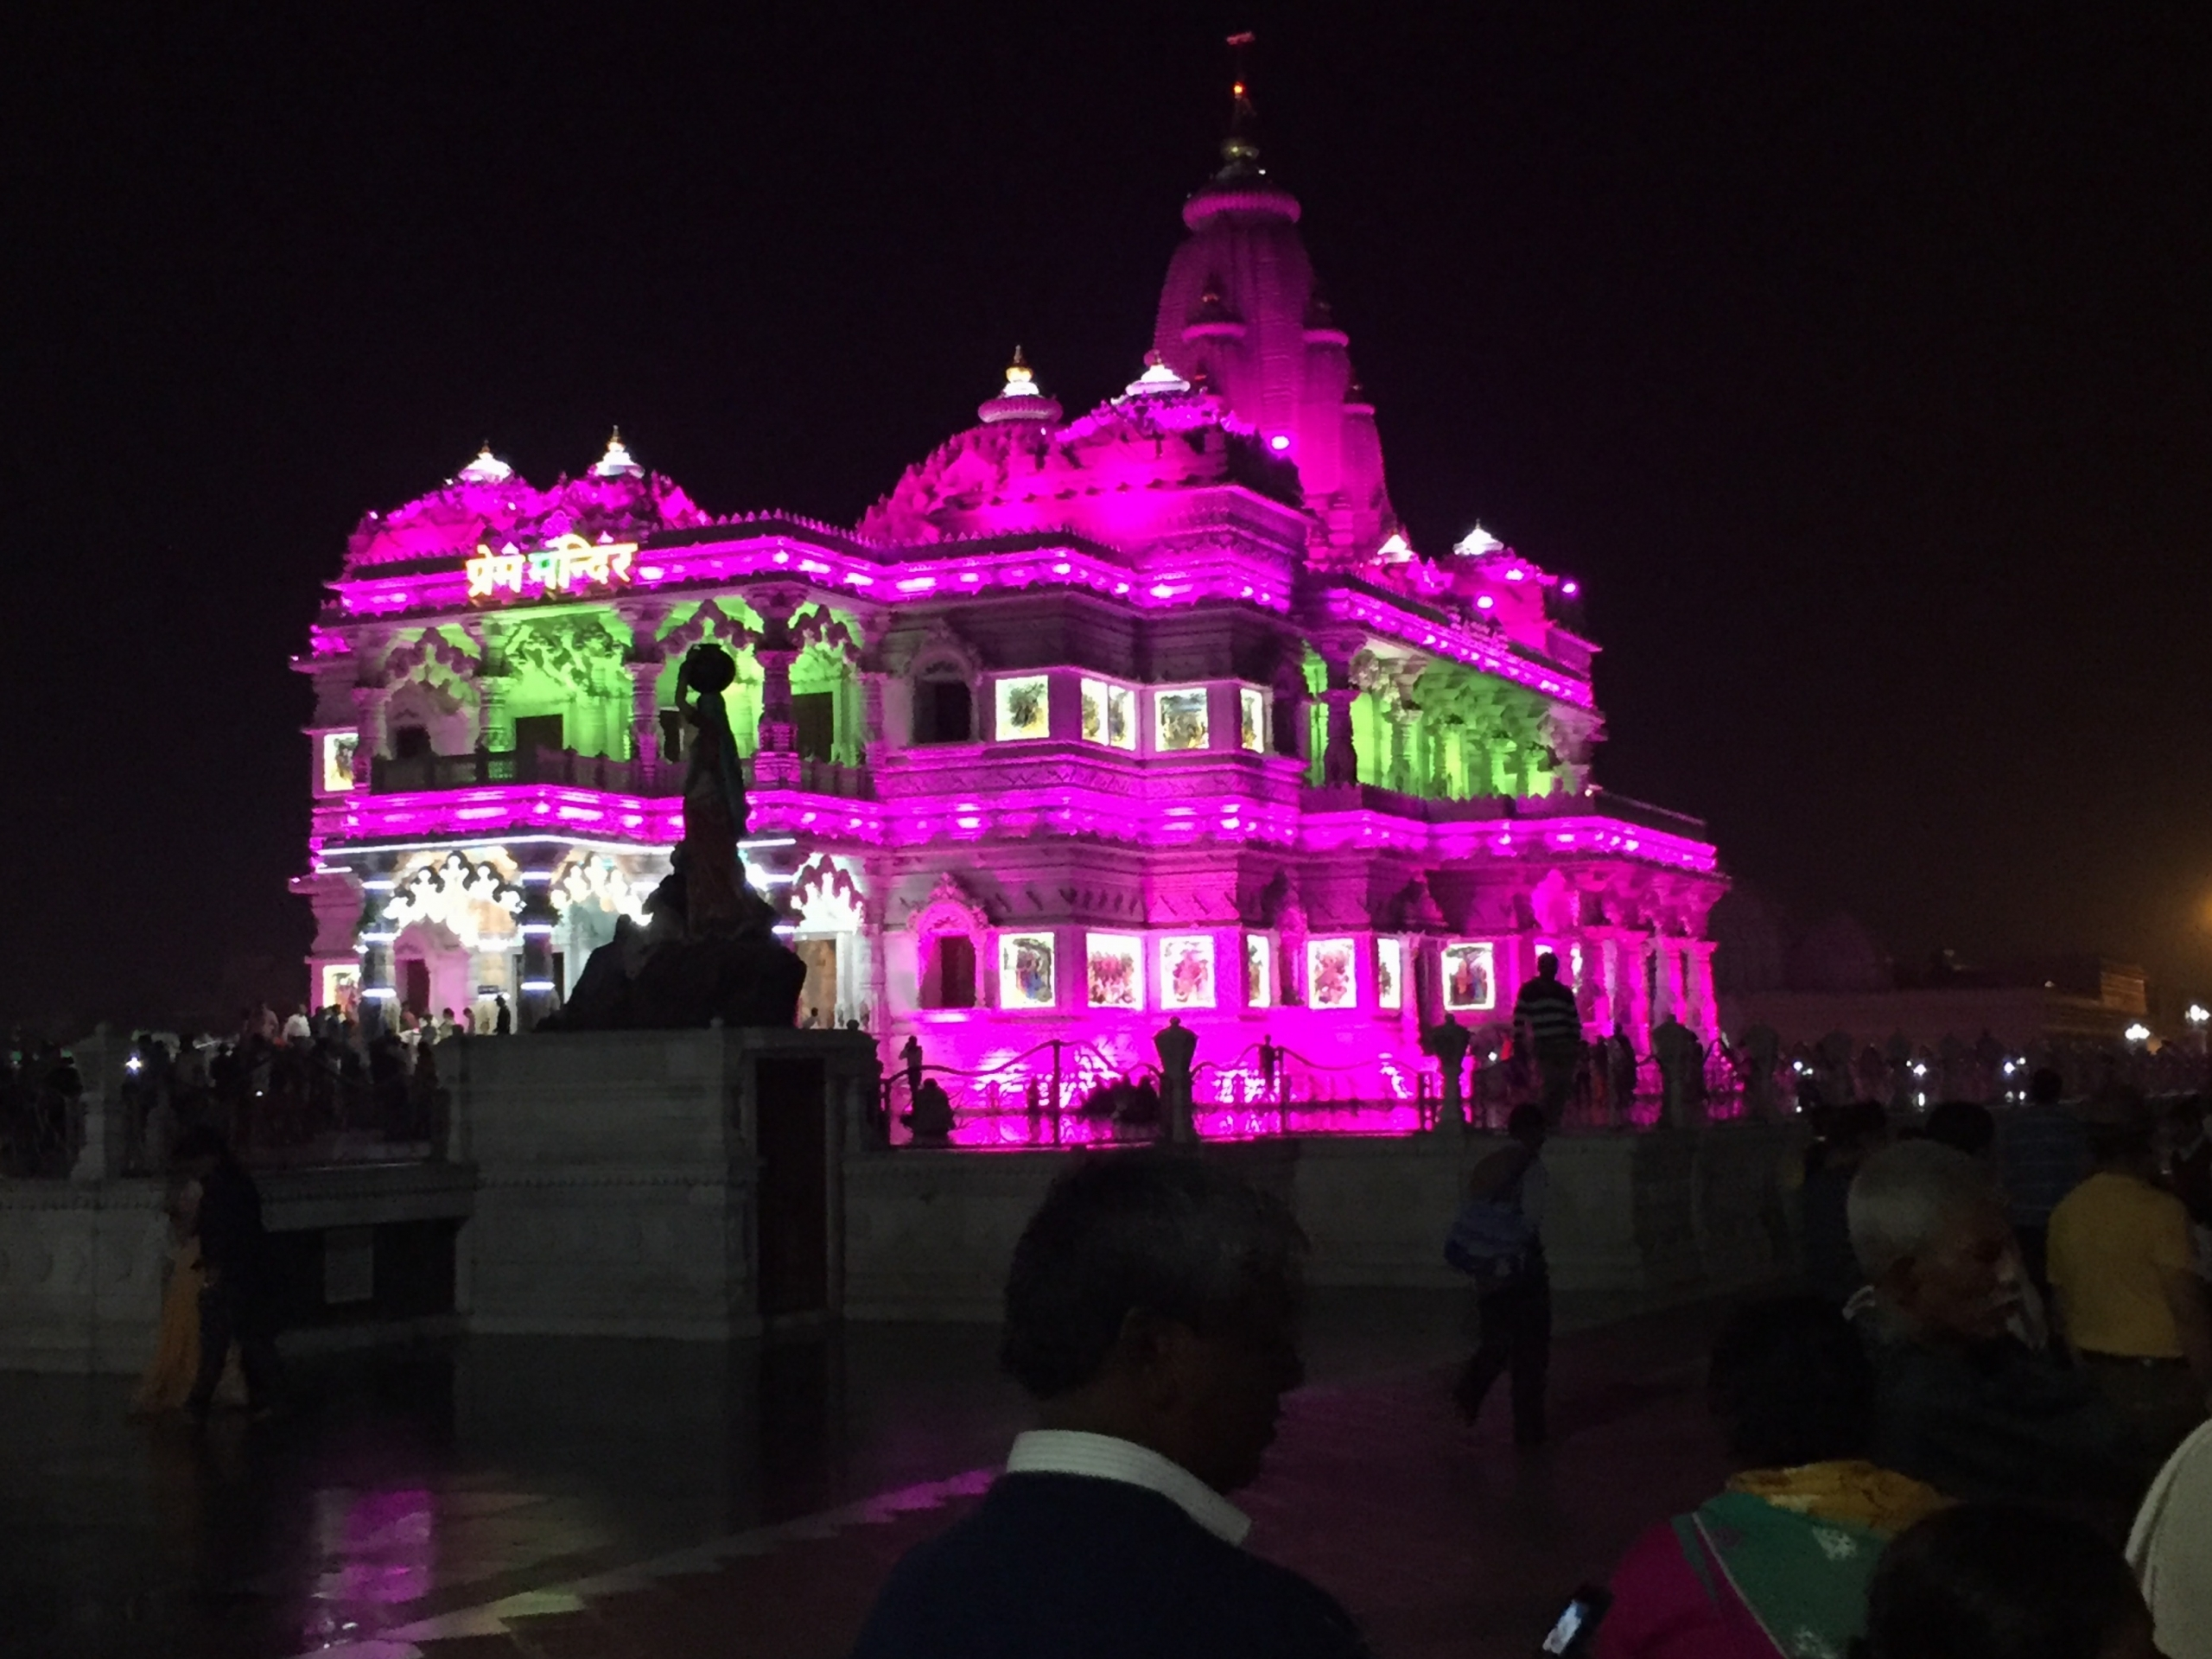 prem-mandir-tempel-in-vrindavan-2-e1458725822702-scaled